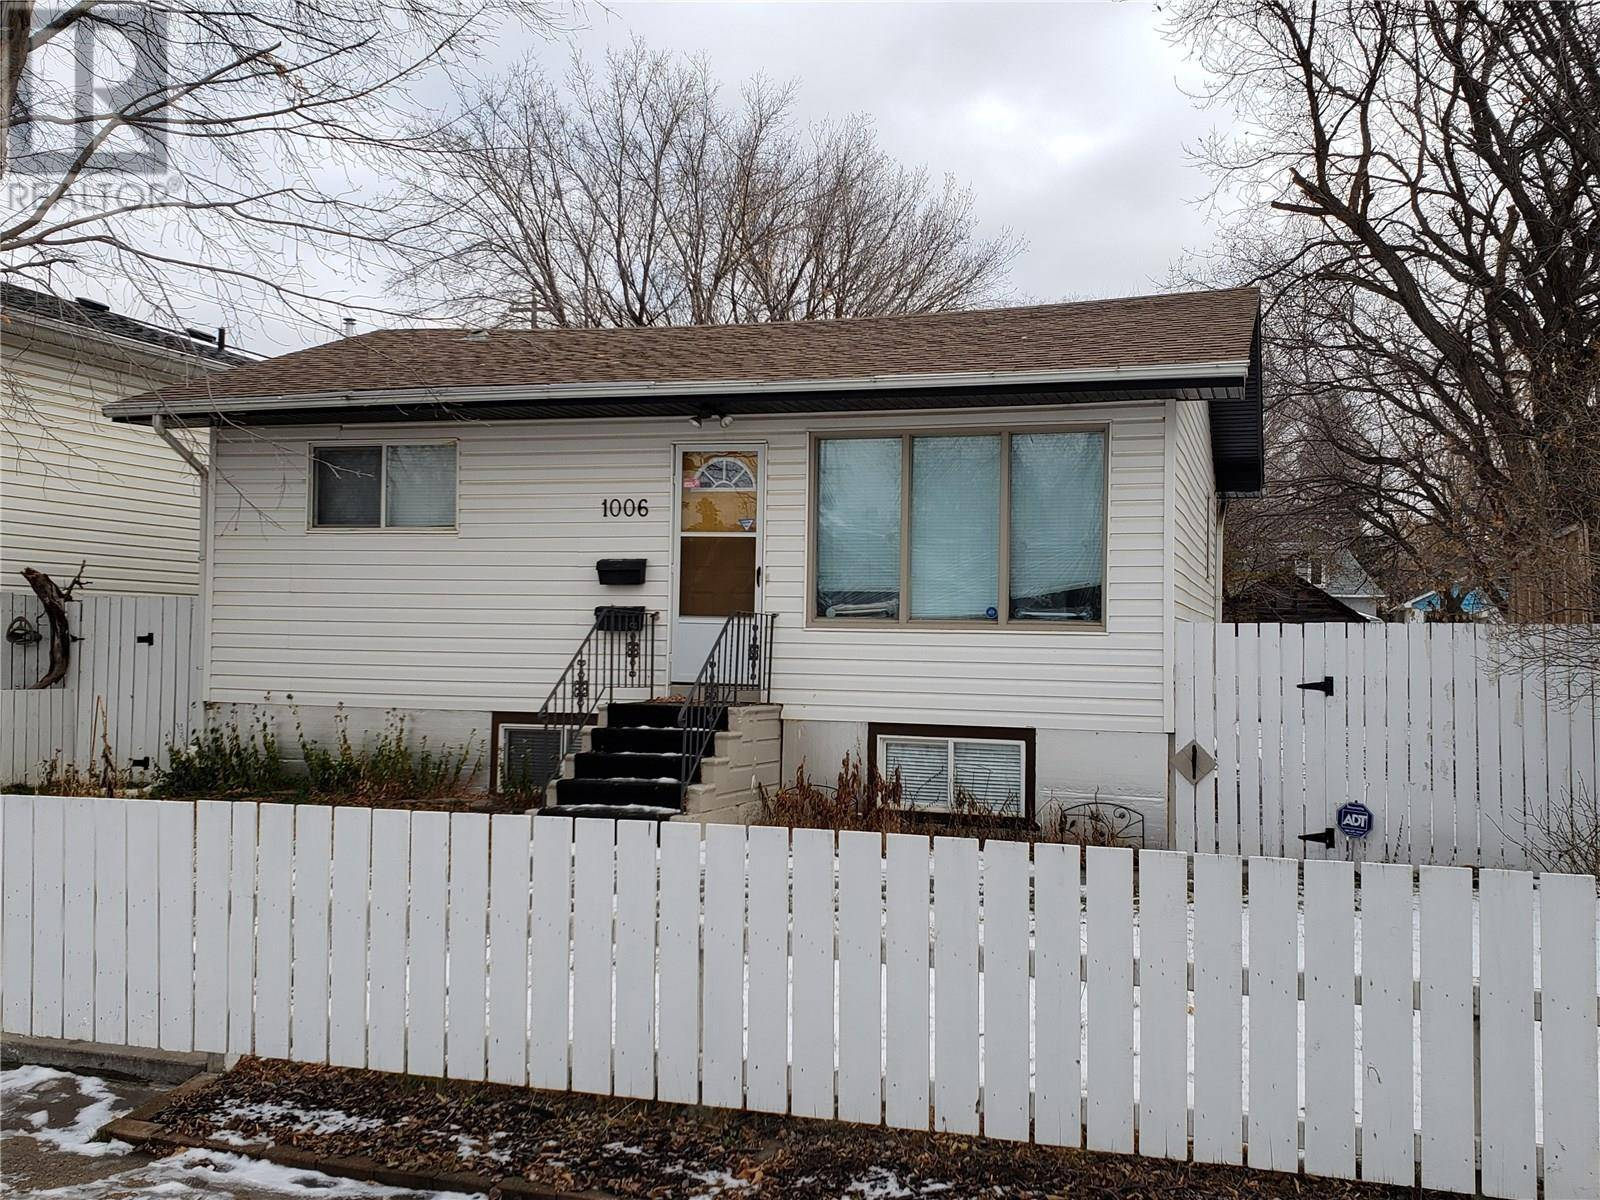 House for sale at 1006 K Ave S Saskatoon Saskatchewan - MLS: SK790794